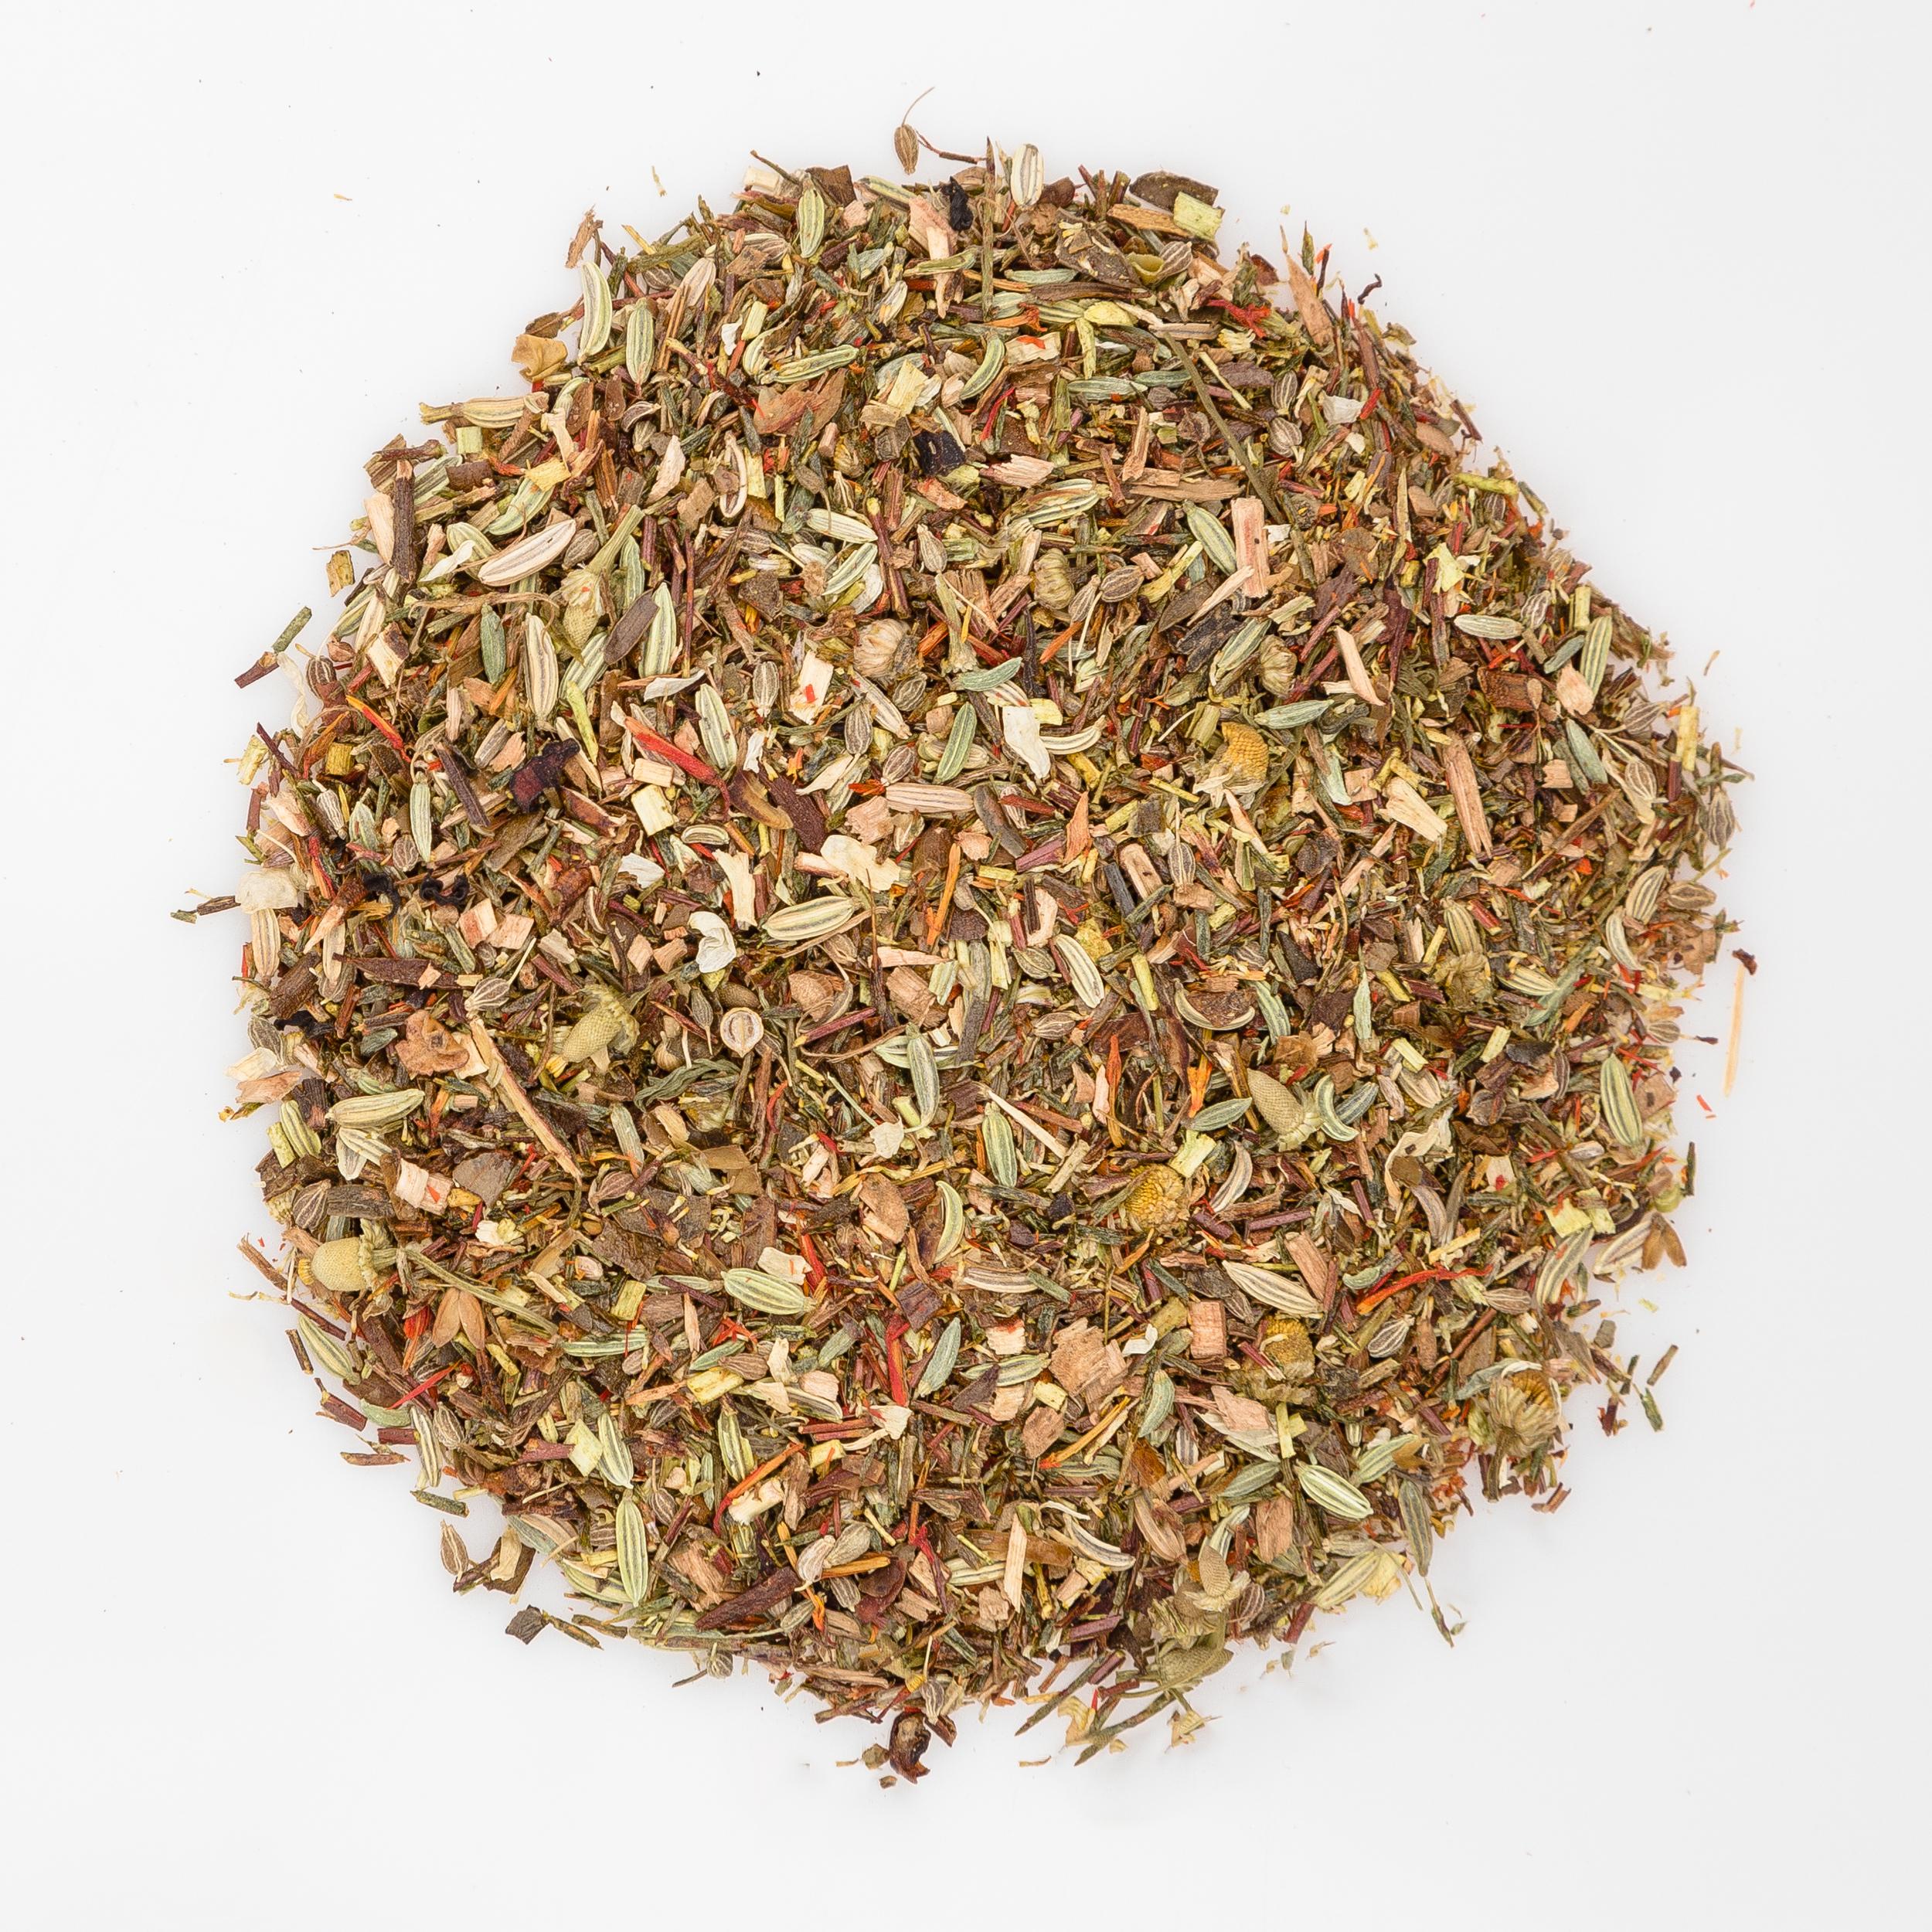 Herbata Melisa ratuje nerwy